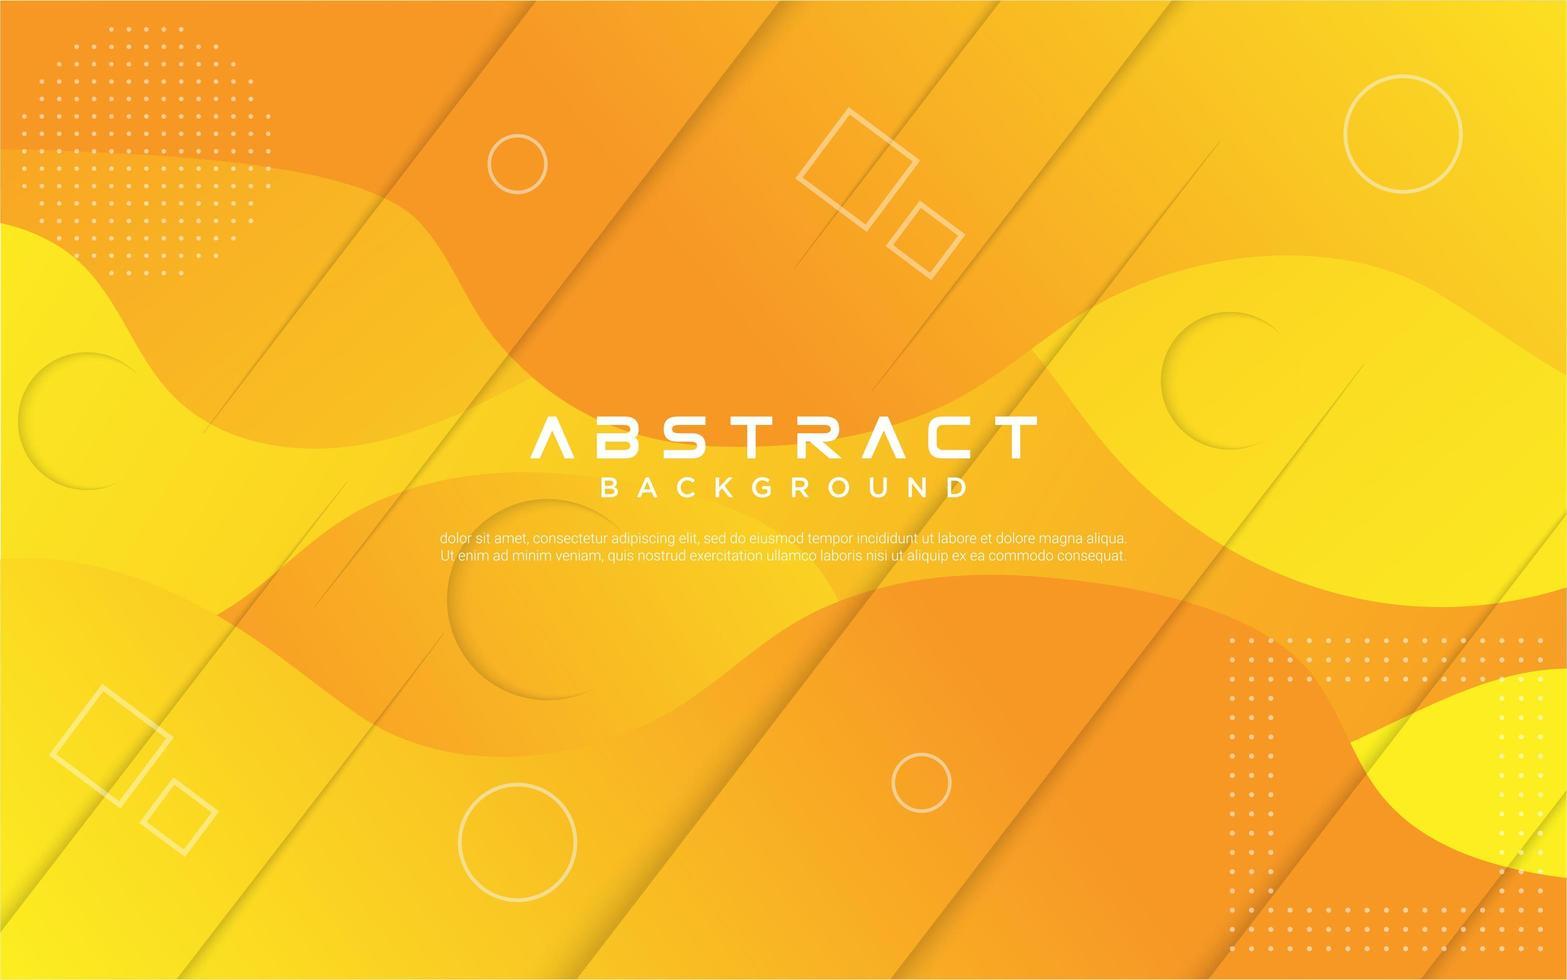 abstraktes Farbverlaufsgelb-Design vektor